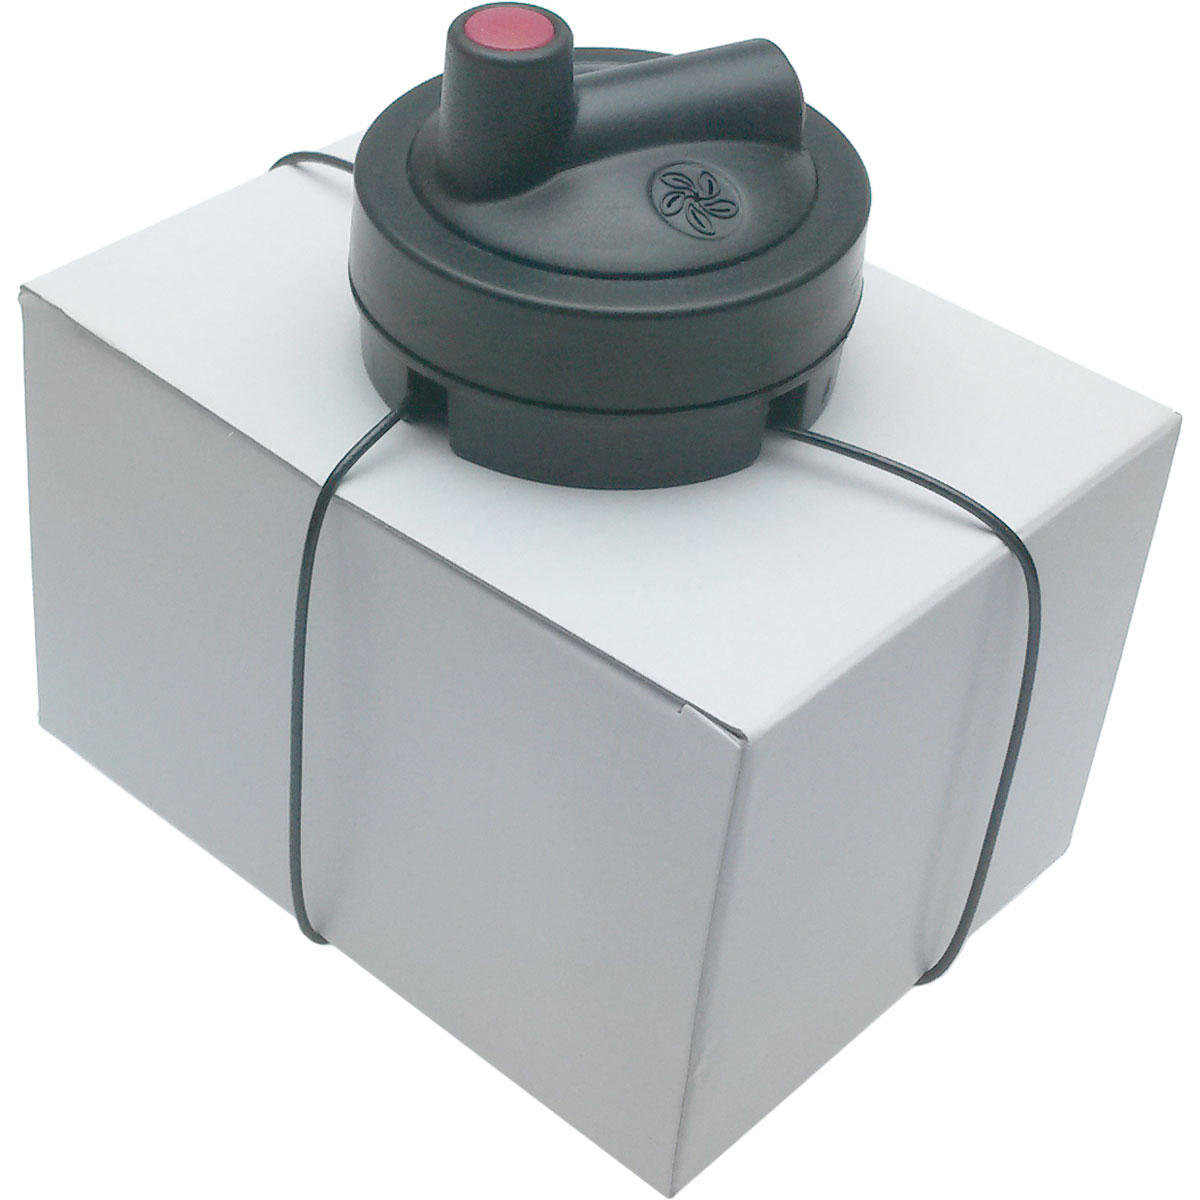 Eticheta rigida pentru cutii, tip paianjen - spider wrap tag RS-65 imagine spy-shop.ro 2021